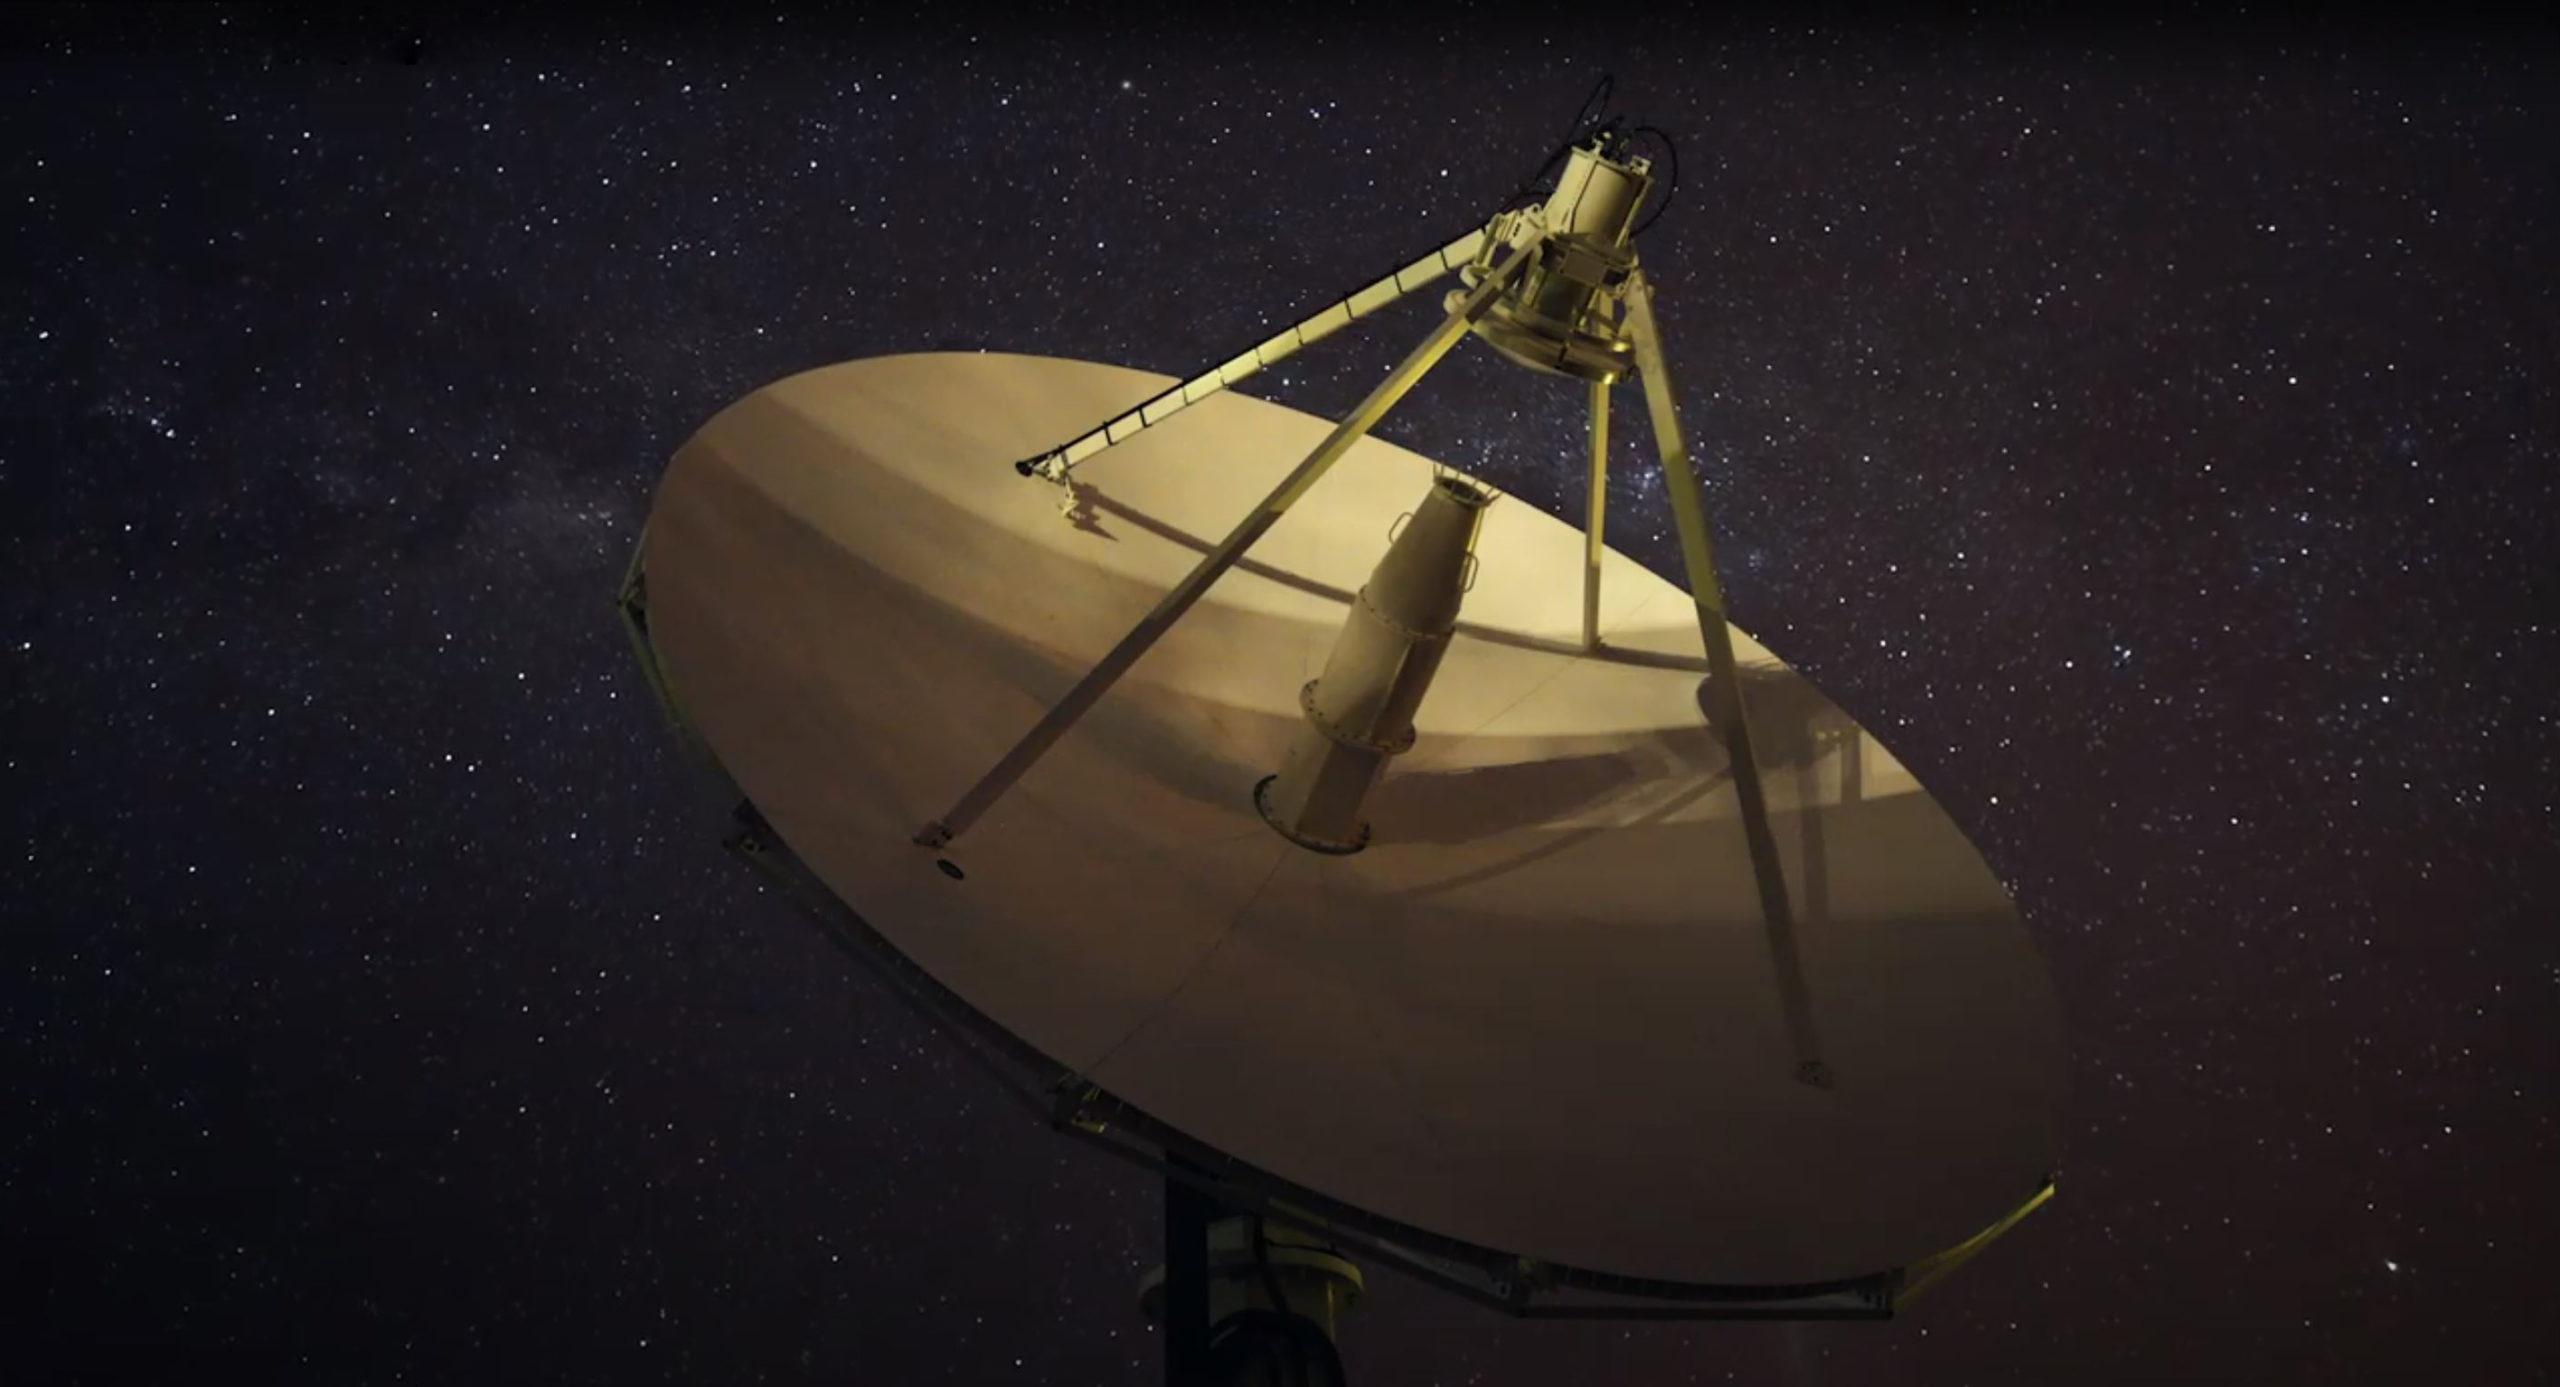 A dimly shot satellite